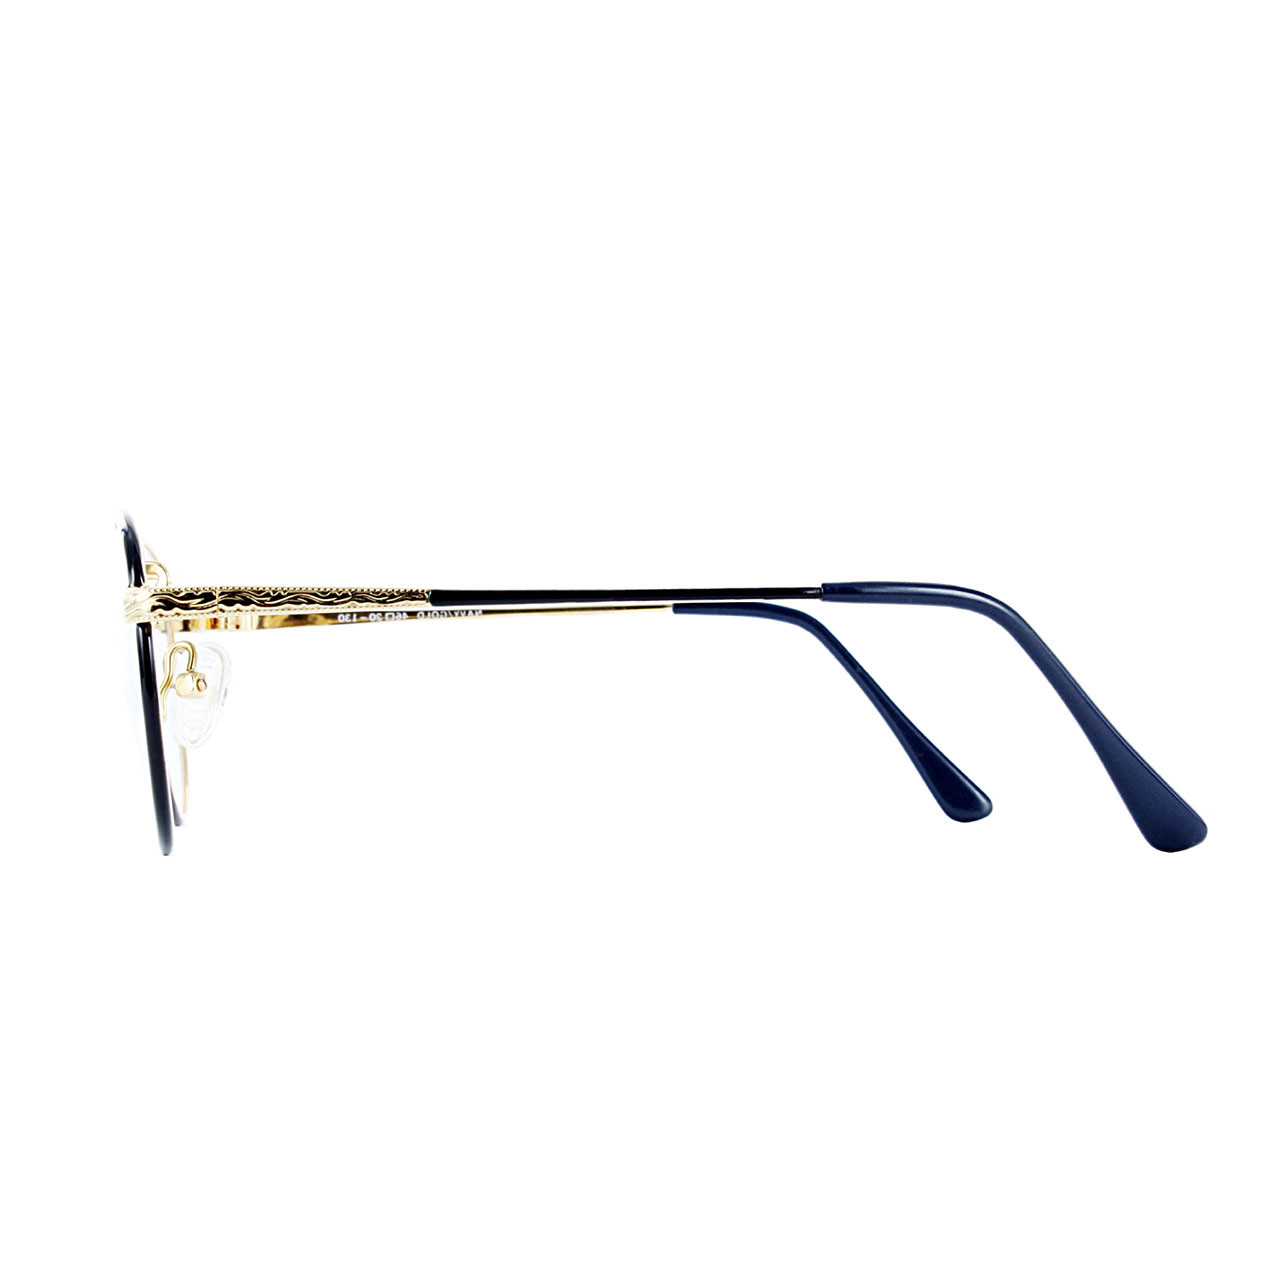 GEEK Eyewear Geek 203 Junior Collection